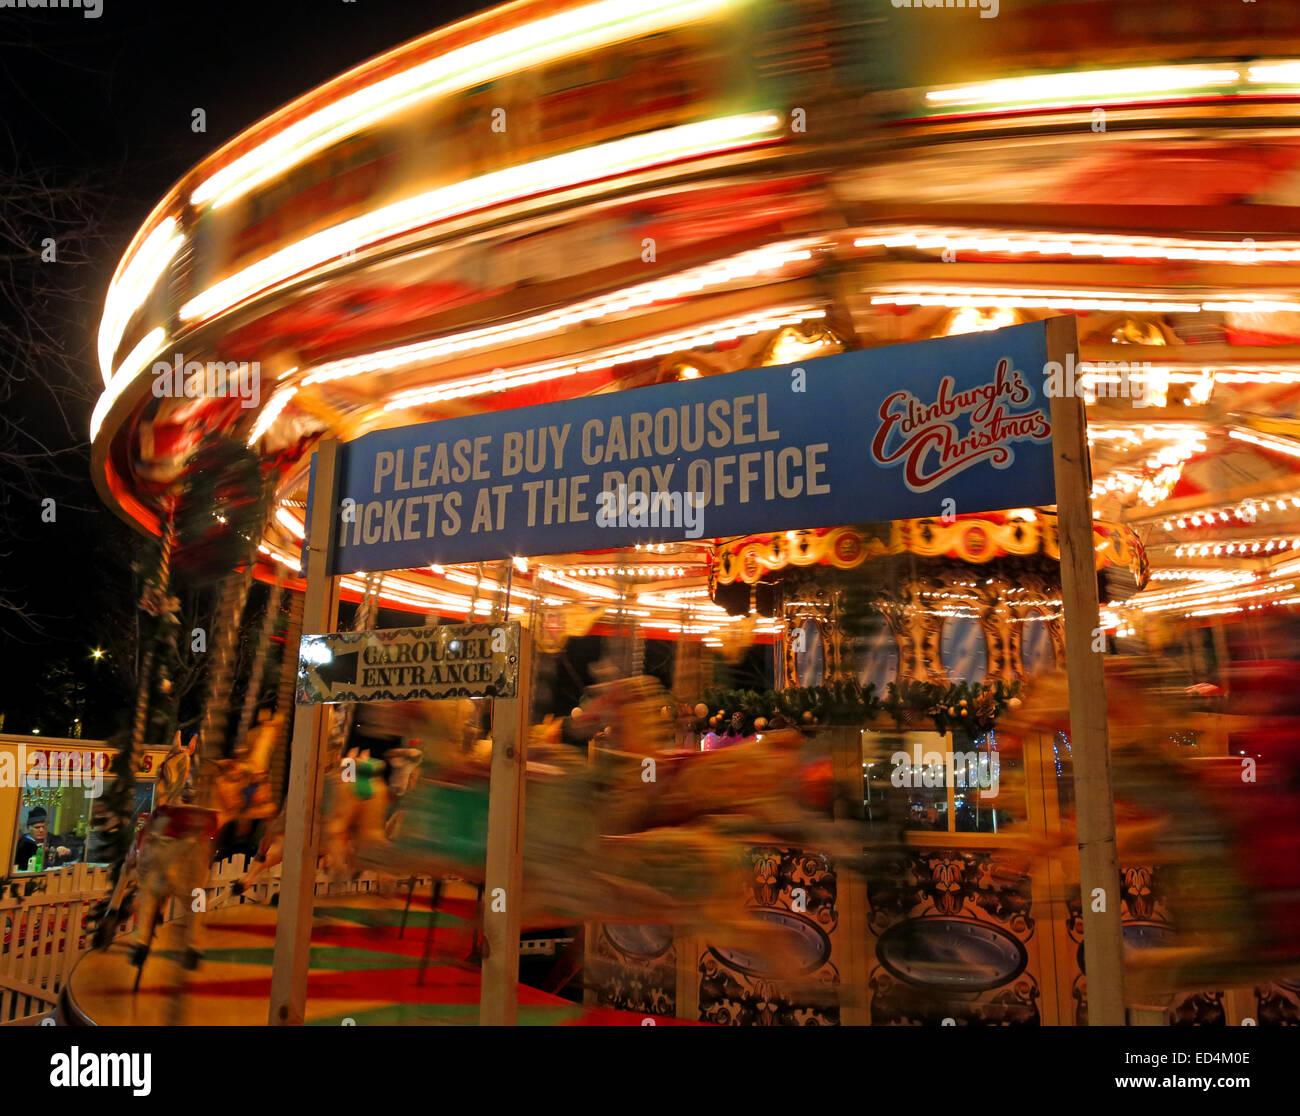 attraction,slide,slides,Edinburgh,dusk,at,St,Andrew,Square,Christmas,Xmas,festival,moving,merry,go,around,Edinburghs,Hogmanay,sign,saying,please,buy,carousel,tickets,at,the,box,office,moving,movement,Tourist,tourism,fun,track,things,to,see,do,GotonySmith,Go Tony Smith,GoTonySmith